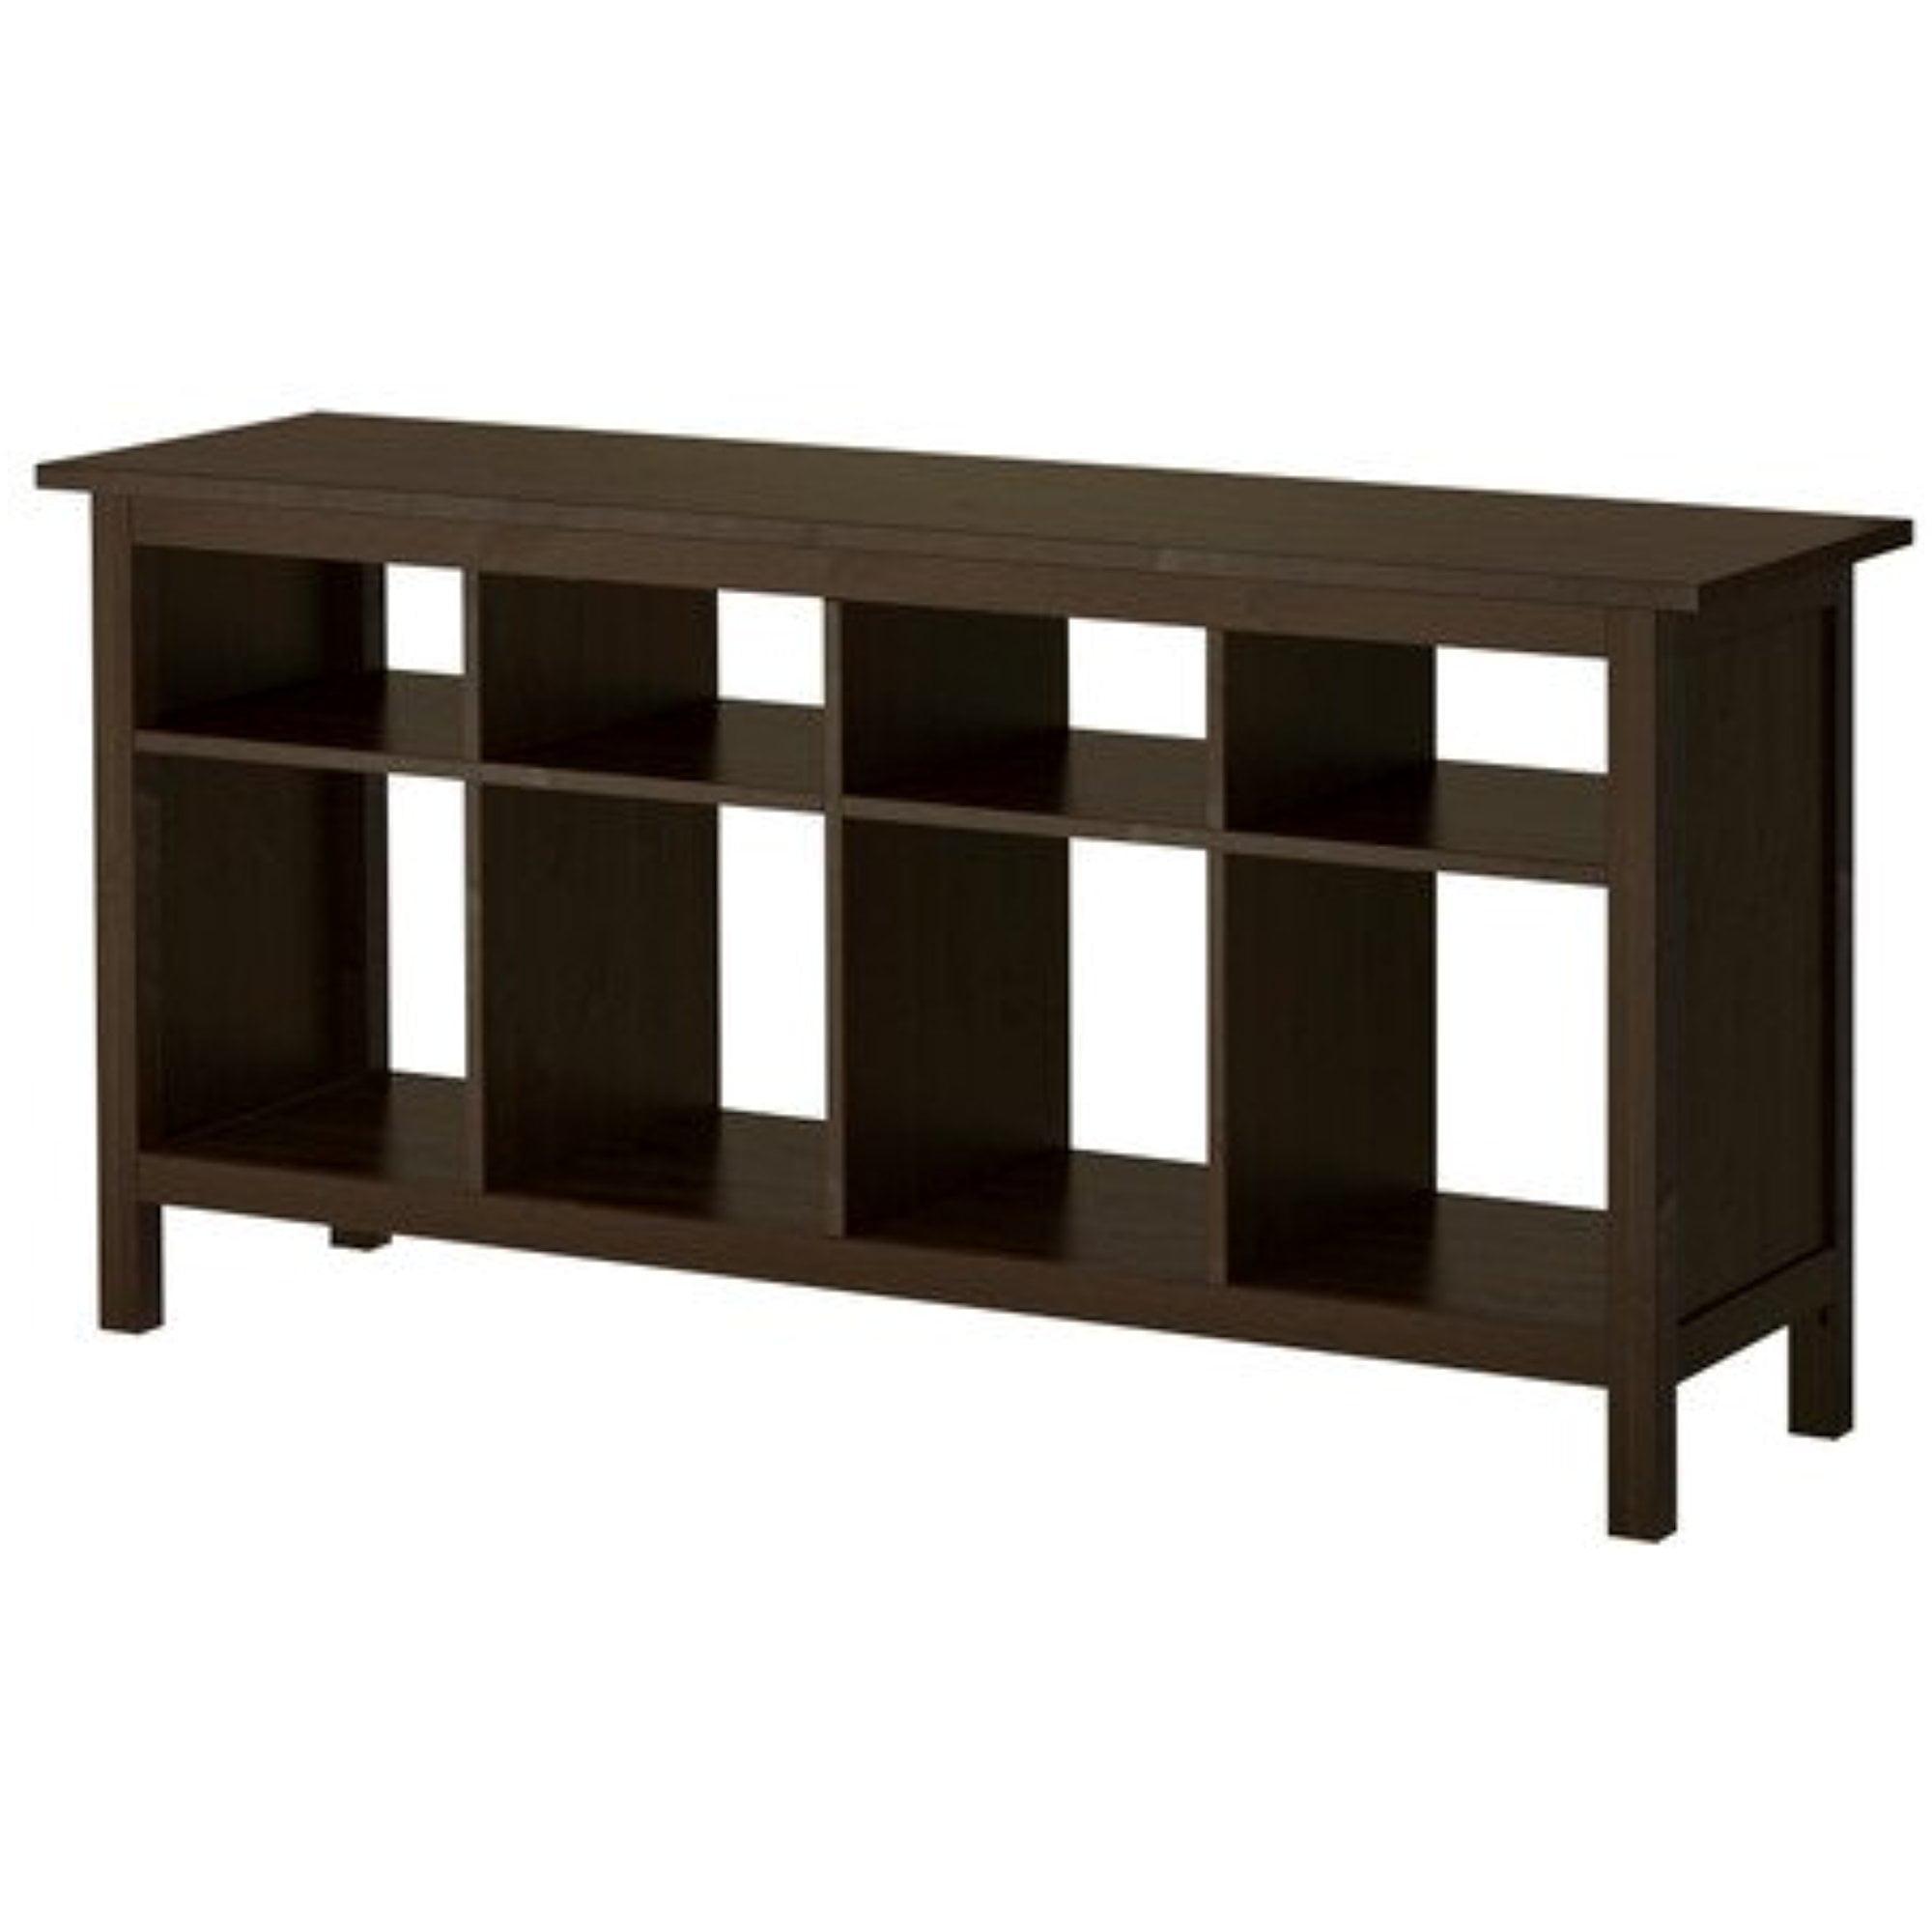 New Ikea Hemnes Sofa Table Black-Brown Solid Wood